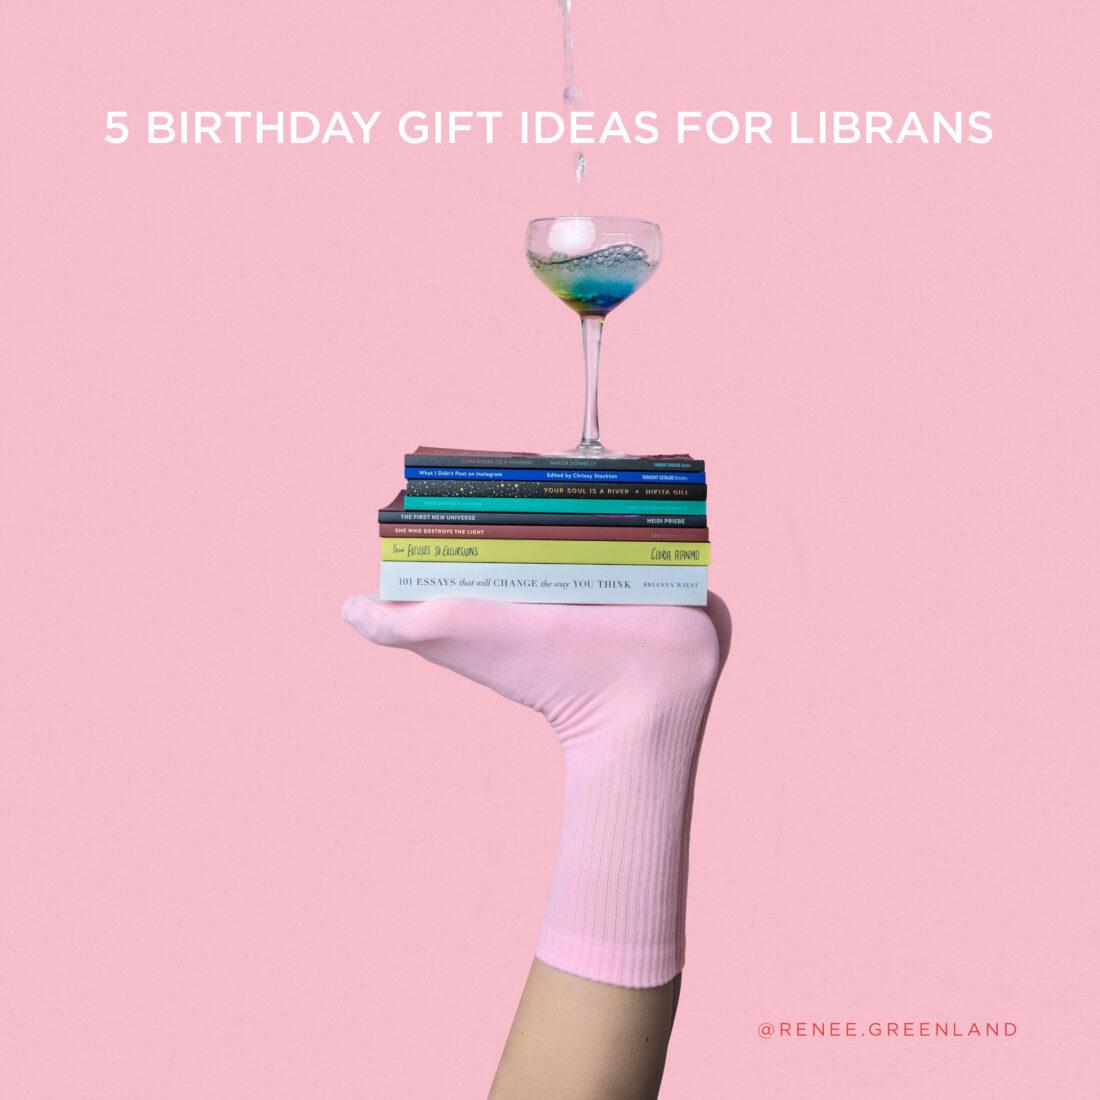 5 gift ideas for libra